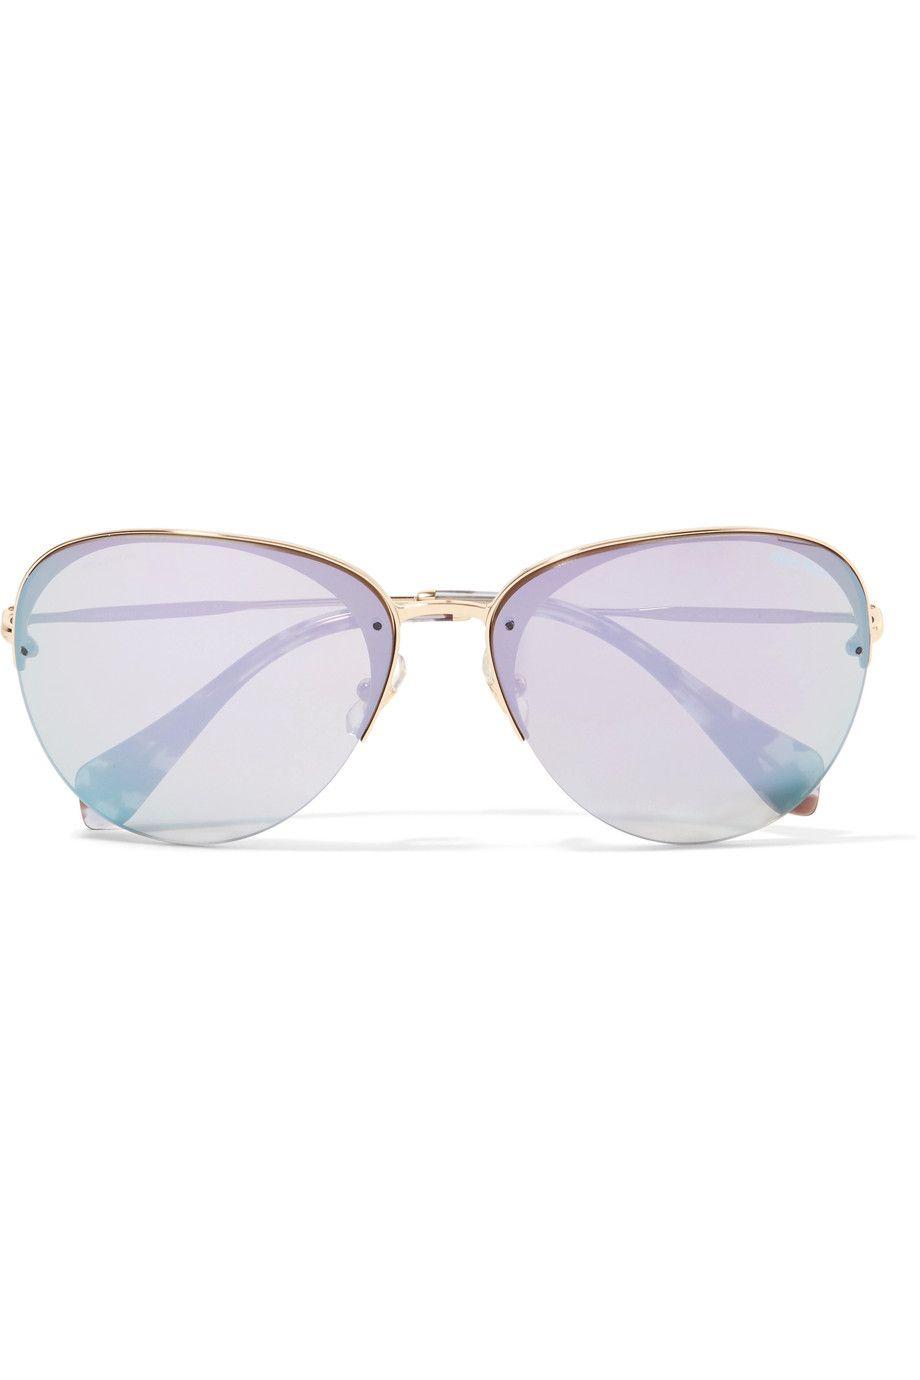 Miu Miu Aviator-style Gold-tone Mirrored Sunglasses